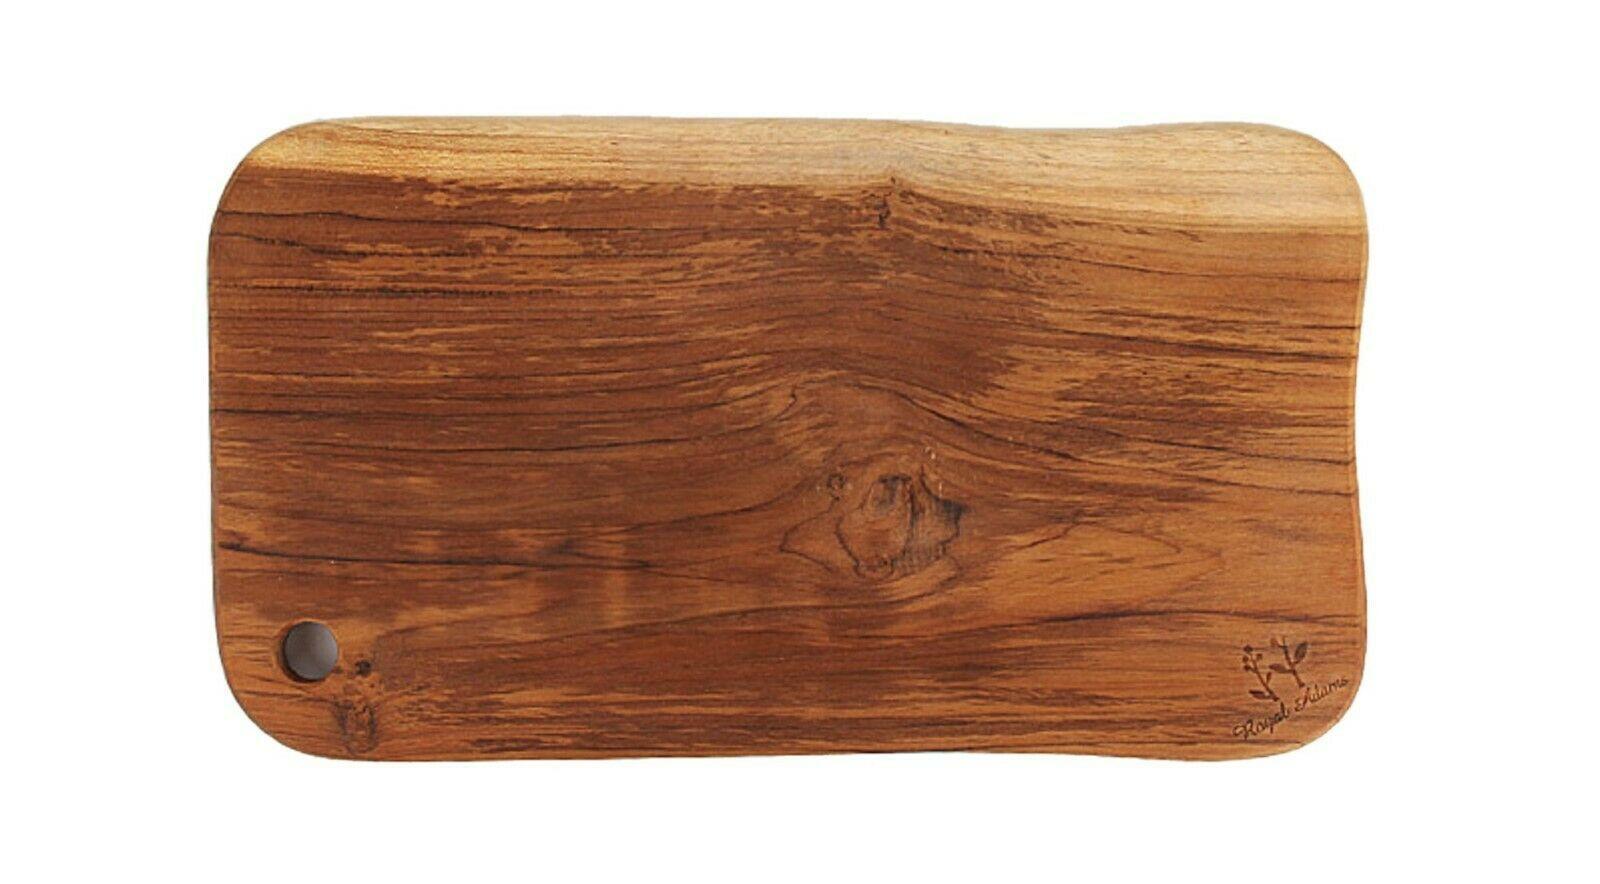 Loyal Adams Teak Sono Kitchen Wooden Chopping Serving Cutting Bread Board